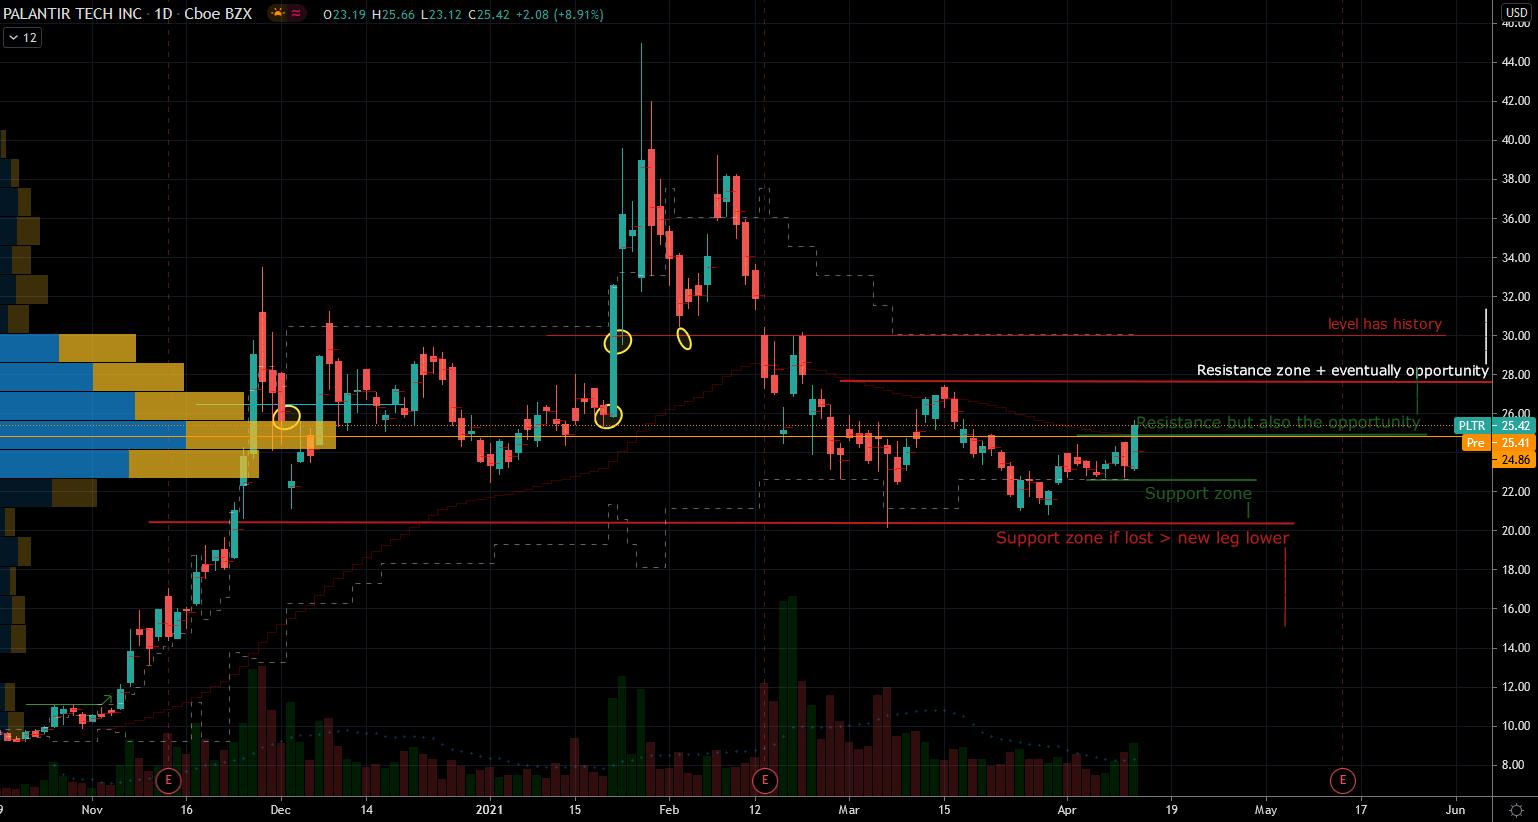 Palantir (PLTR) Stock Chart Showing Set Range